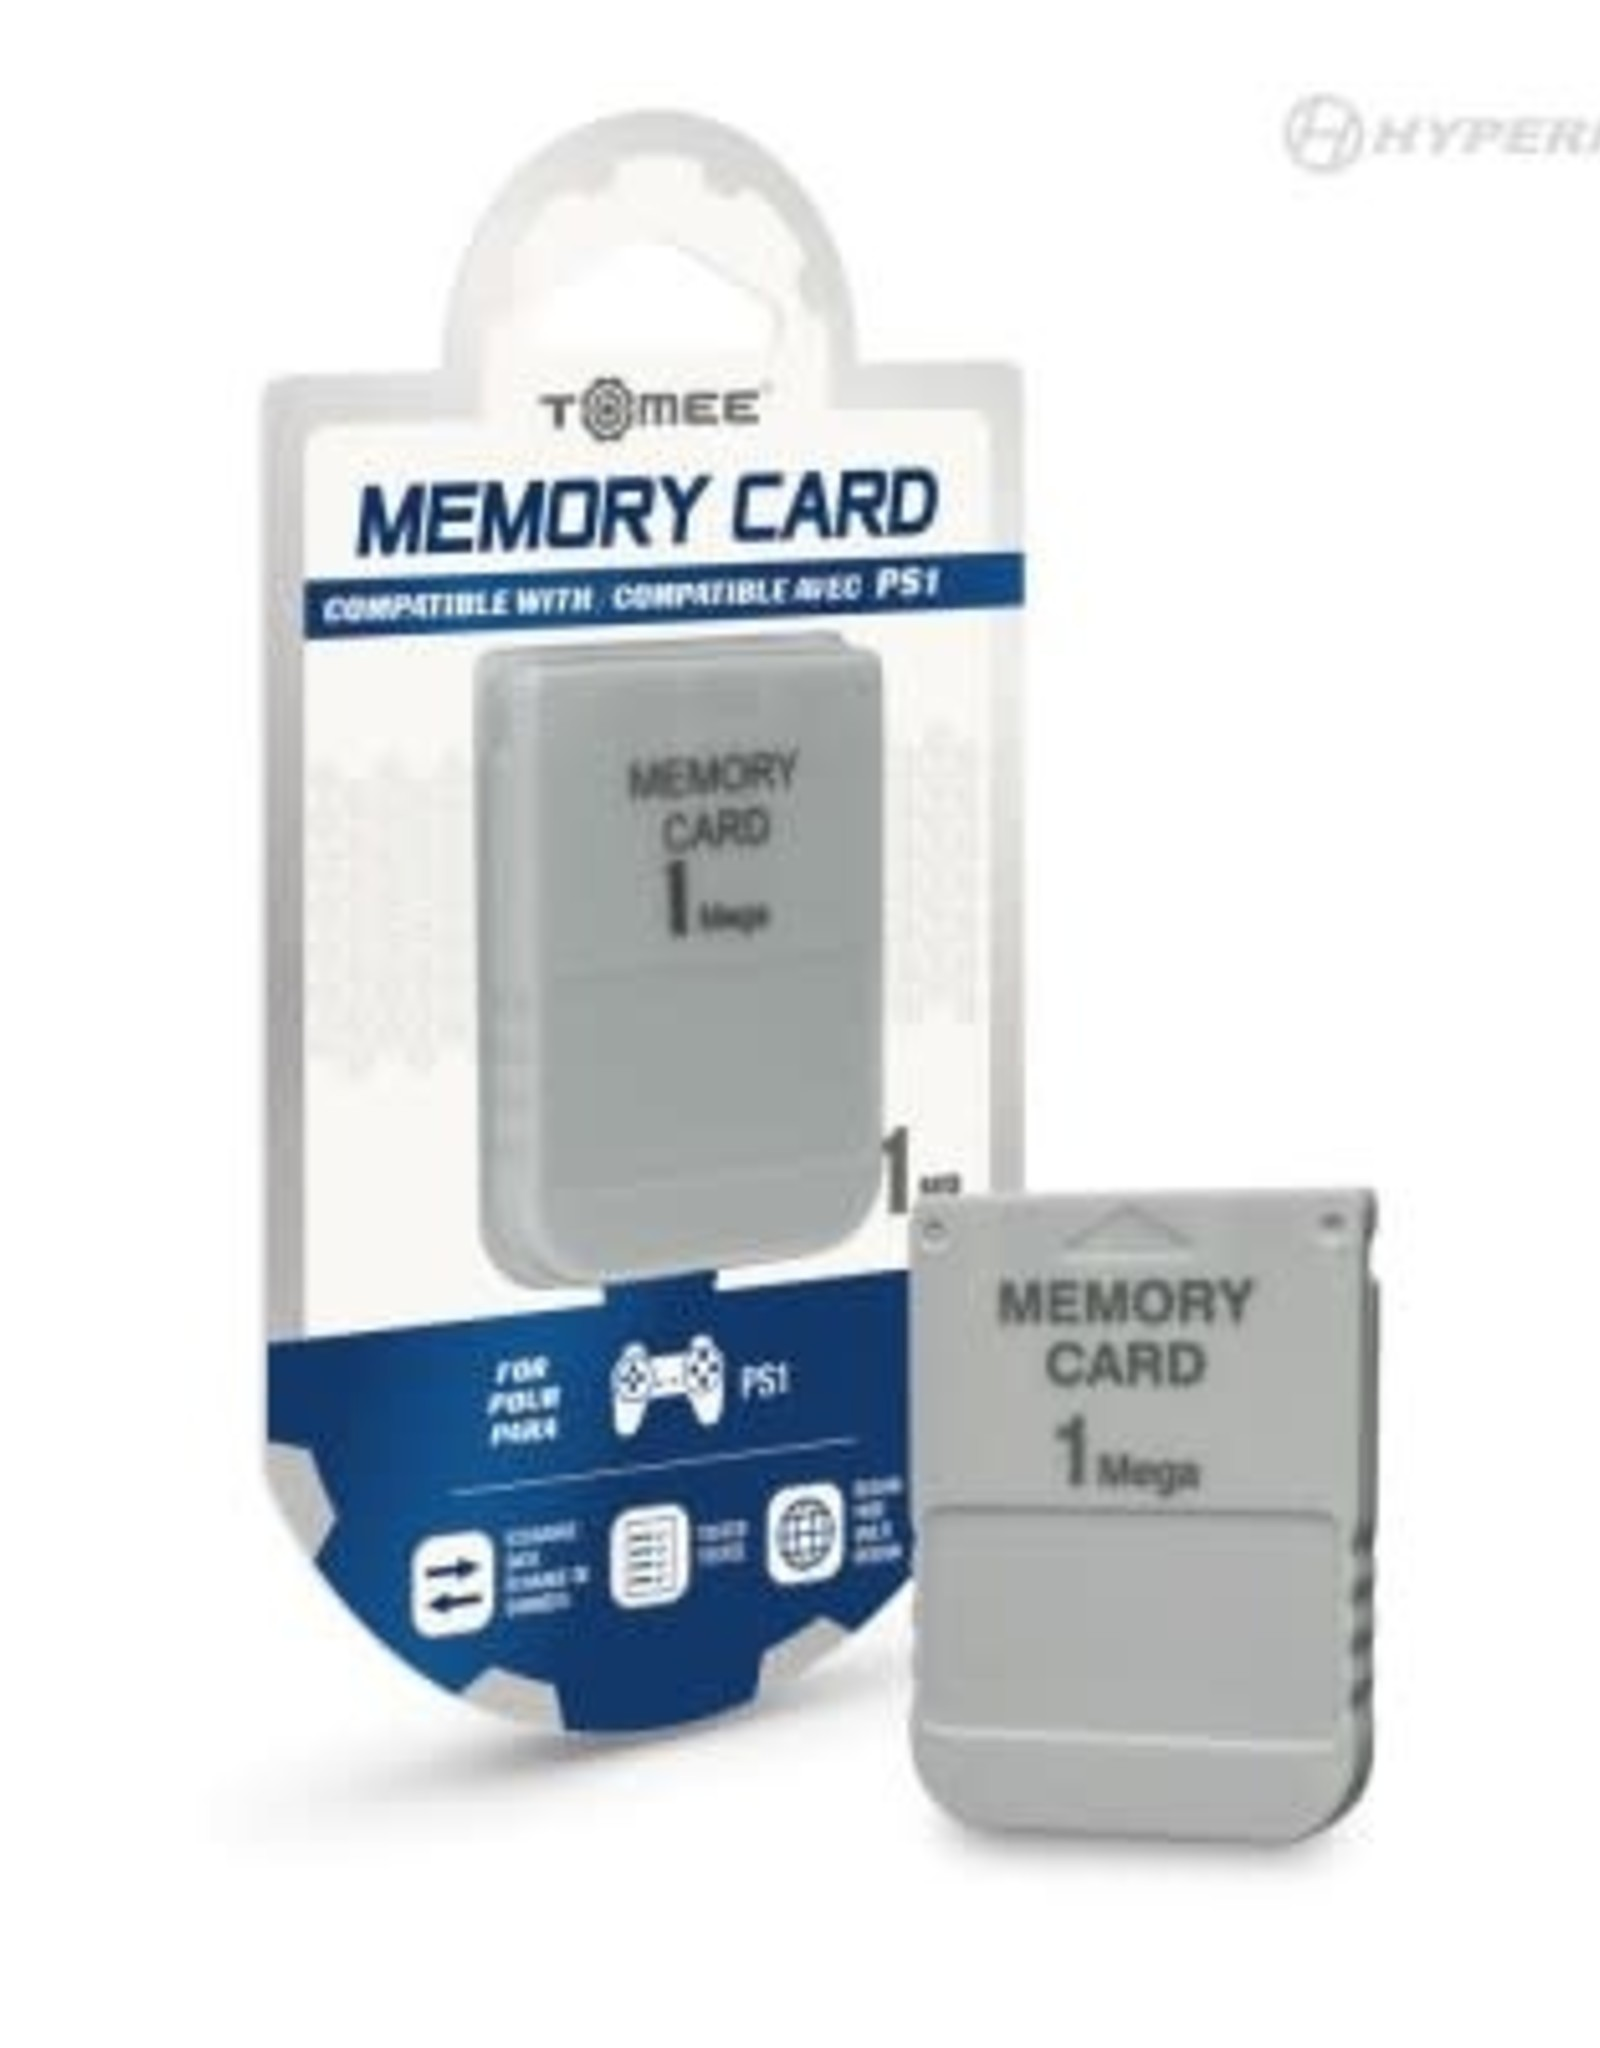 Tomee 1 MB Memory Card PS1